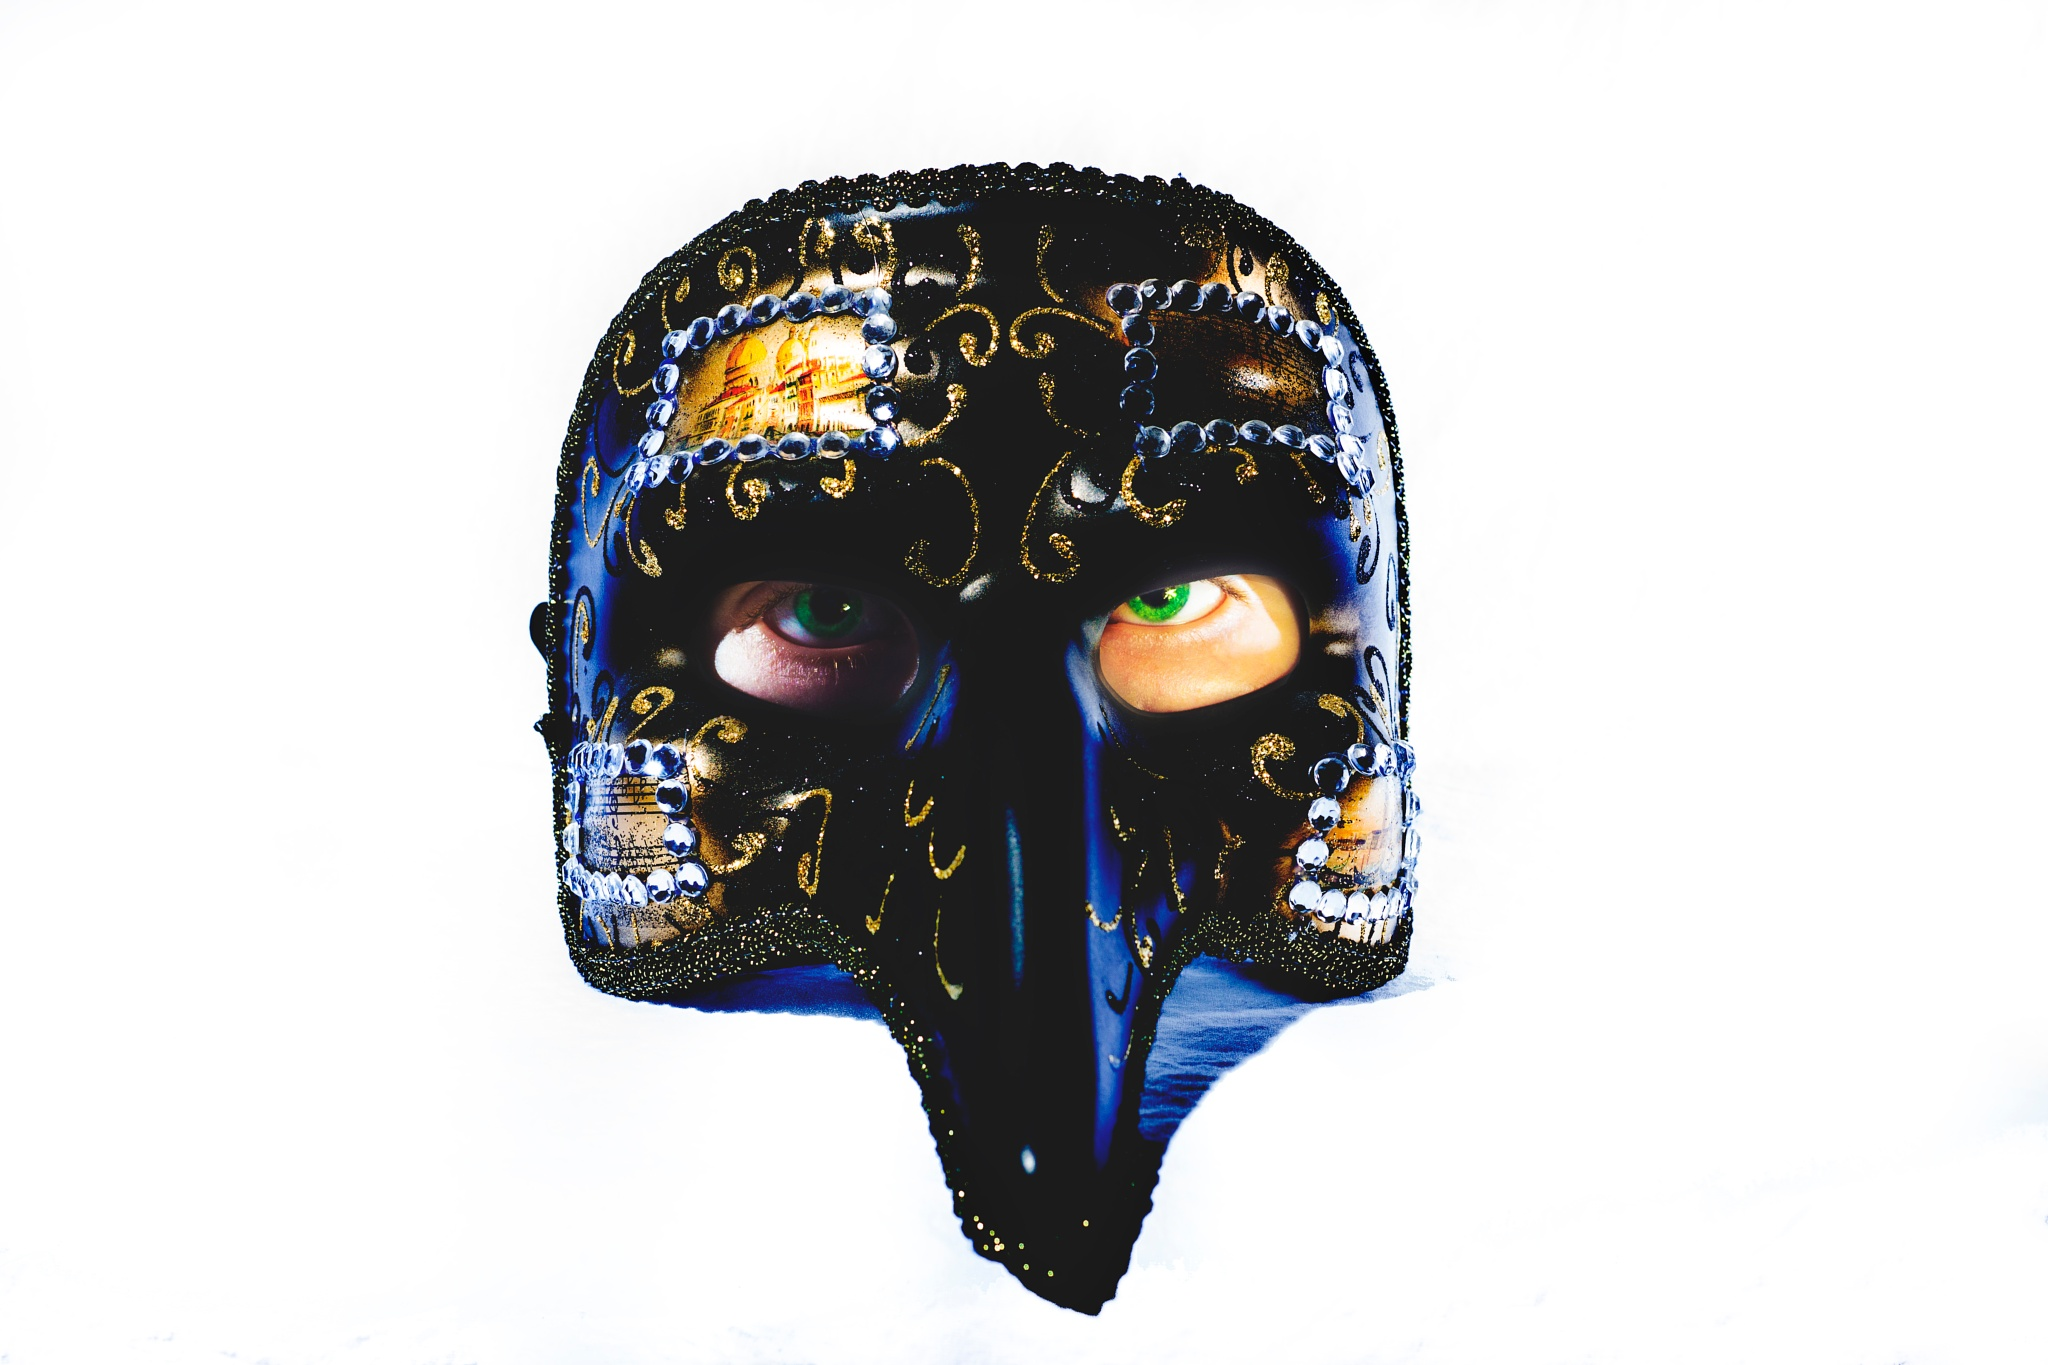 The Masquerade by kcfletcher03